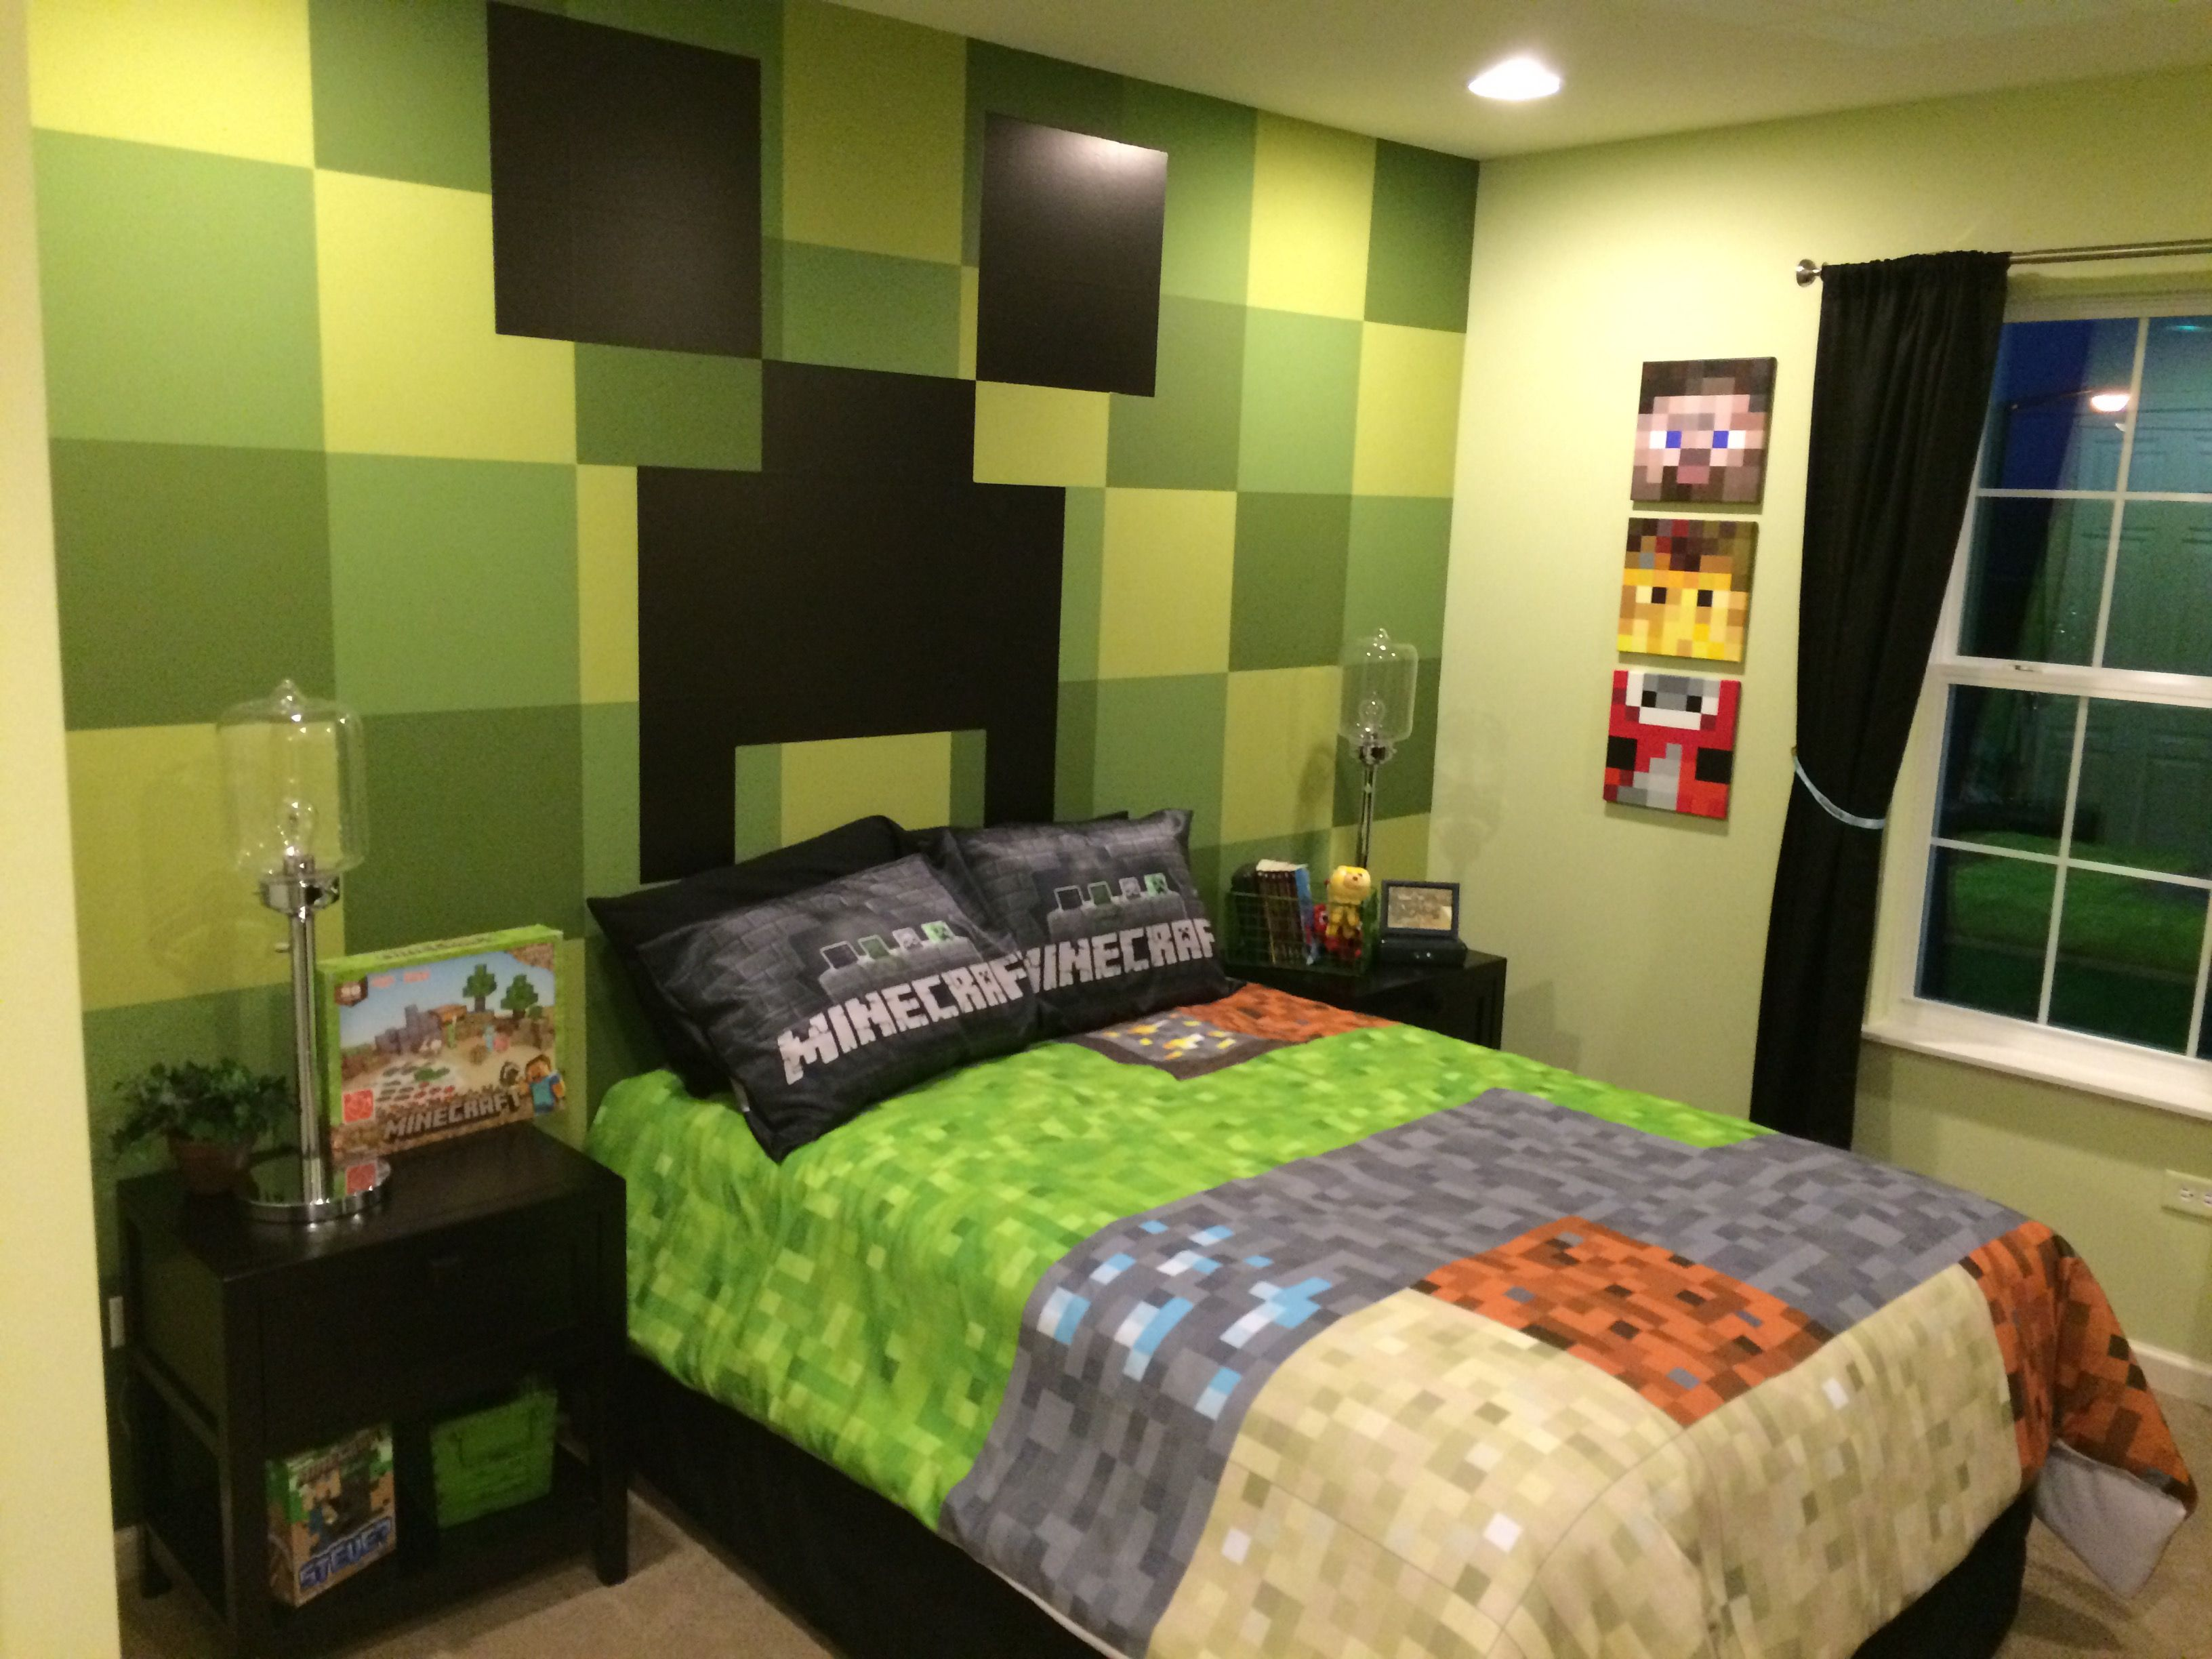 Trying to define minecraft is tricky. Minecraft bedroom   Minecraft bedroom decor, Boys bedroom ...